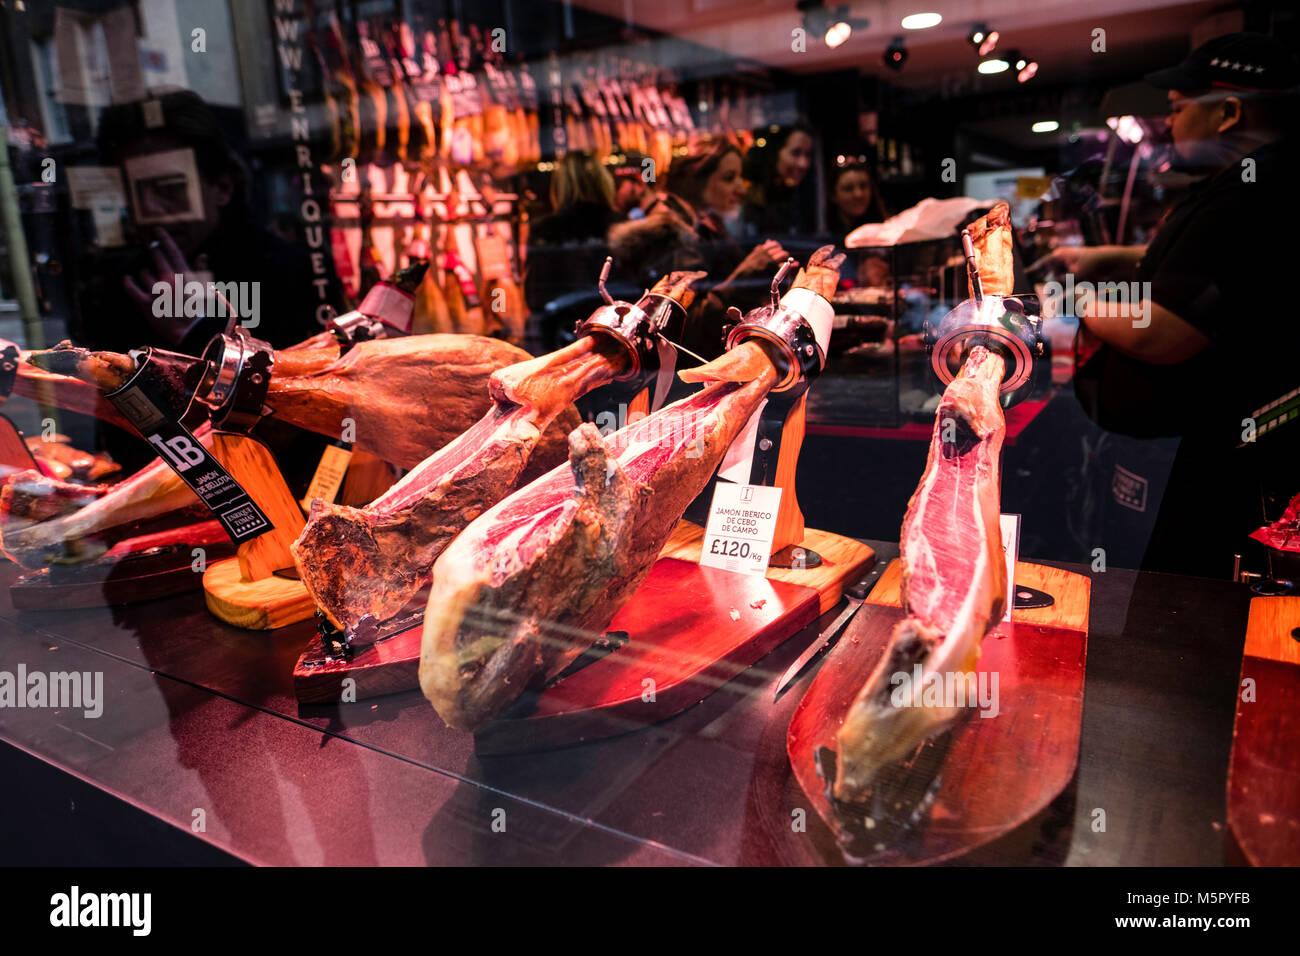 Spanish ham on sale, Wardour Street, London, United Kingdom - Stock Image